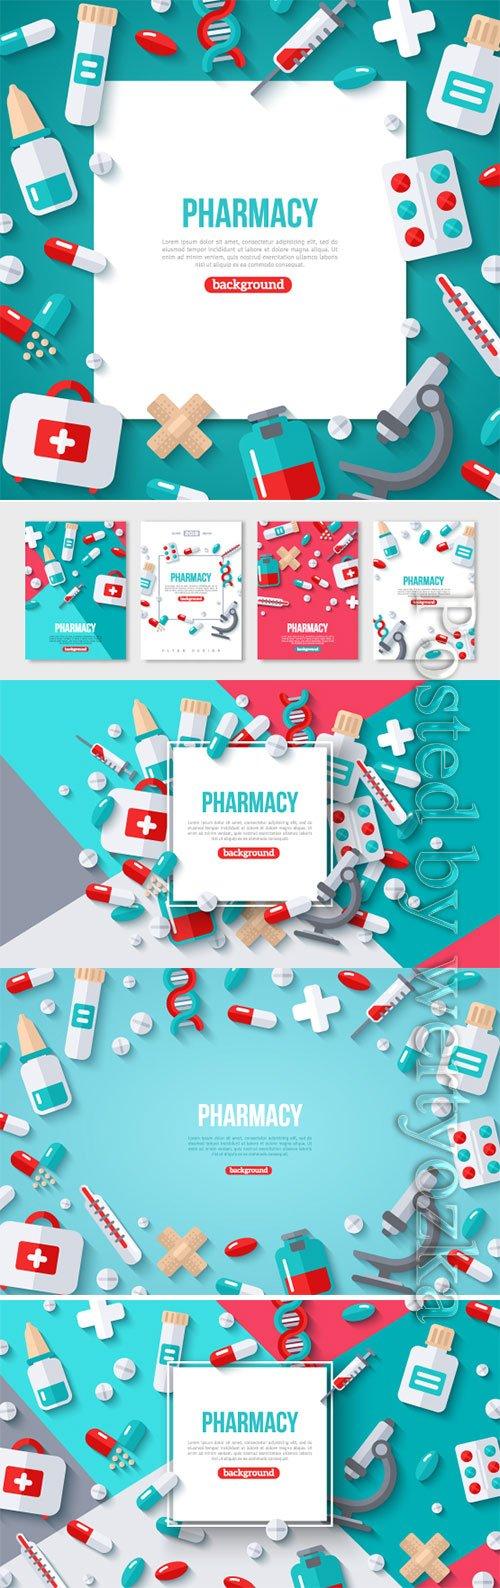 Pharmacy Banner Flat Icons